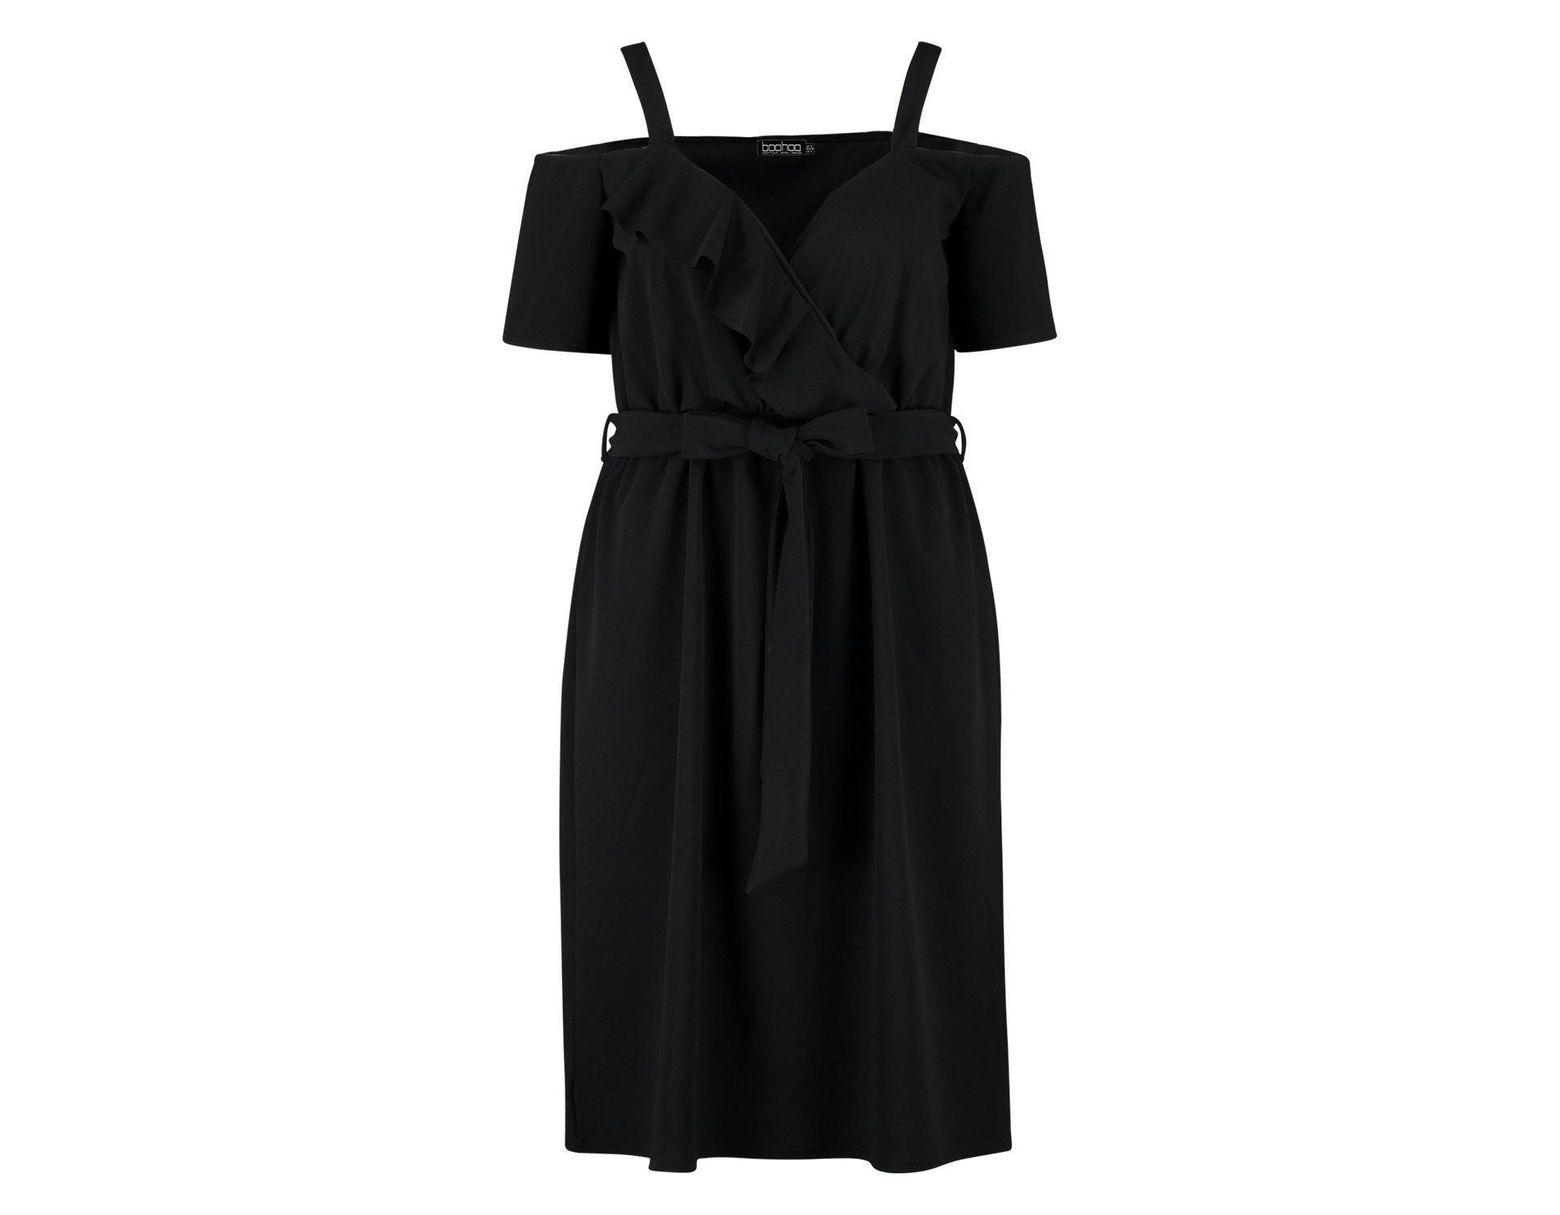 cf61cc2e5907 Boohoo Plus Plunge Ruffle Belt Midi Dress in Black - Lyst